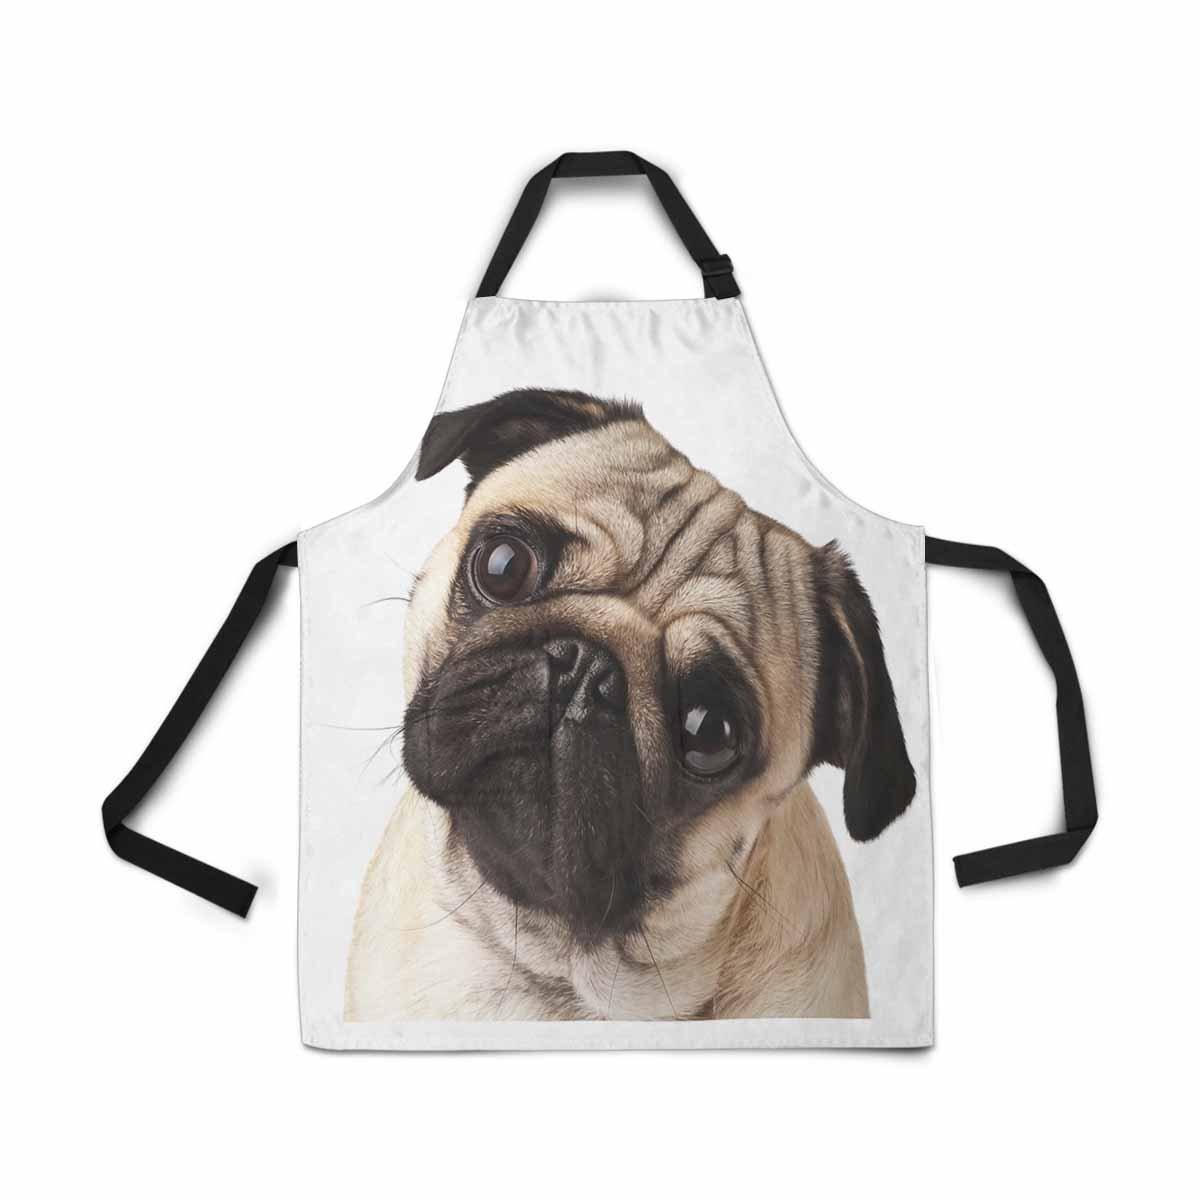 InterestPrint Close-Up Pug Dog Apron for Women Men Girls Chef with Pockets, Lovely Animal Unisex Adjustable Bib Apron Kitchen for Cooking Baking Gardening Home